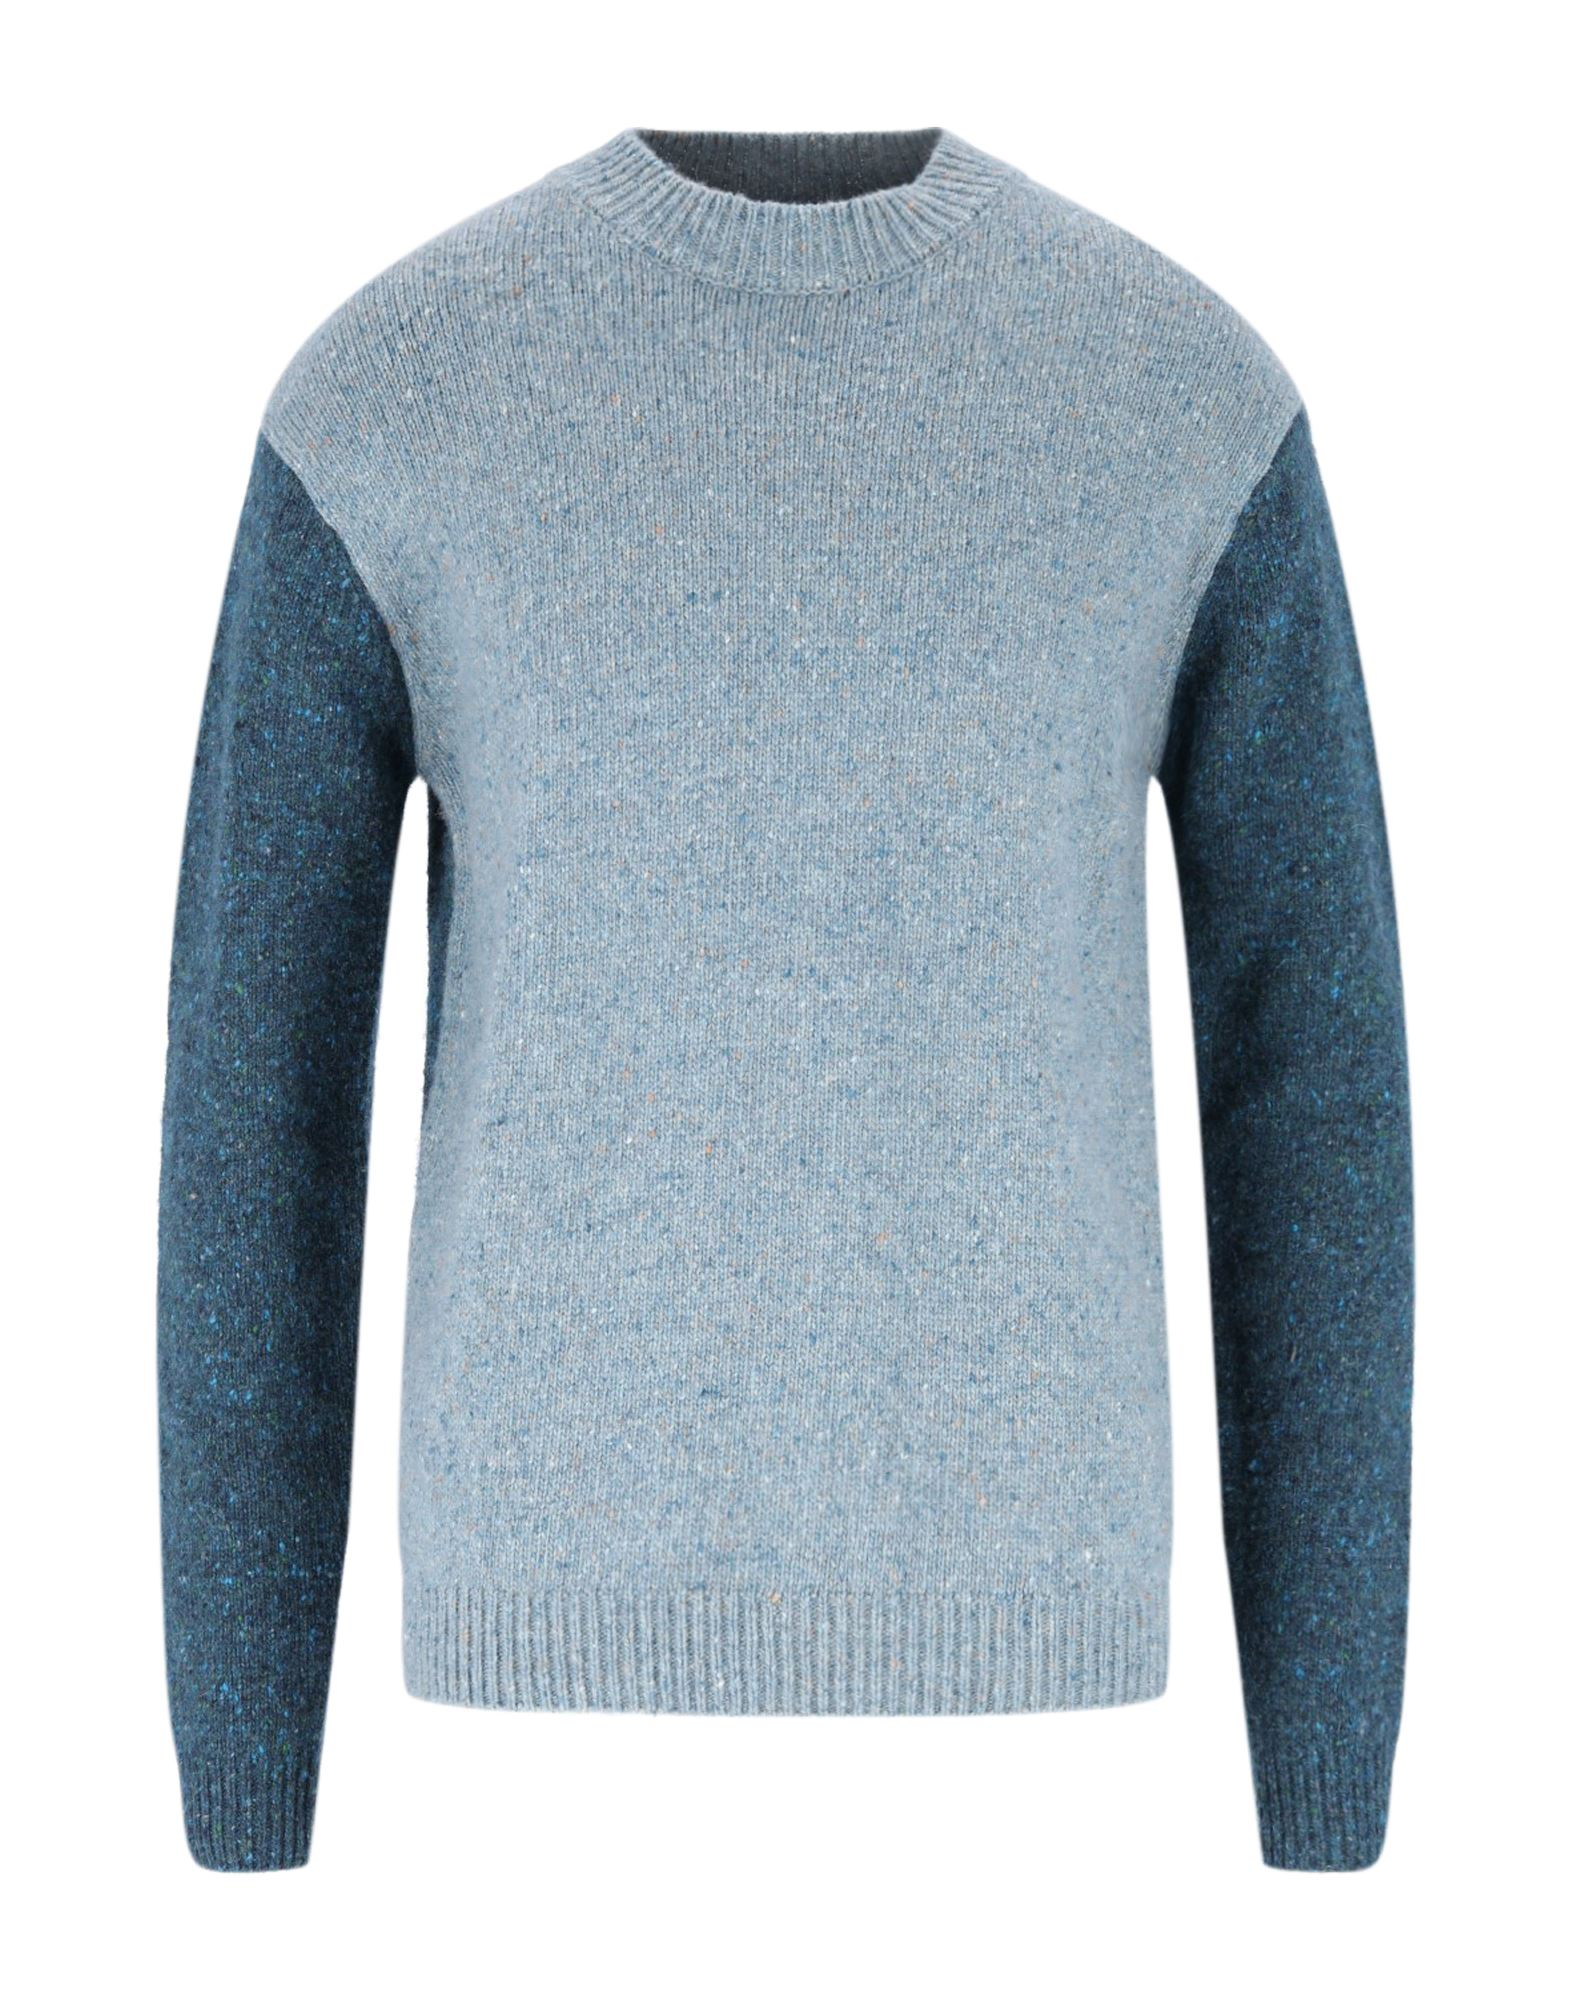 Le Mont St Michel Sweaters In Pastel Blue